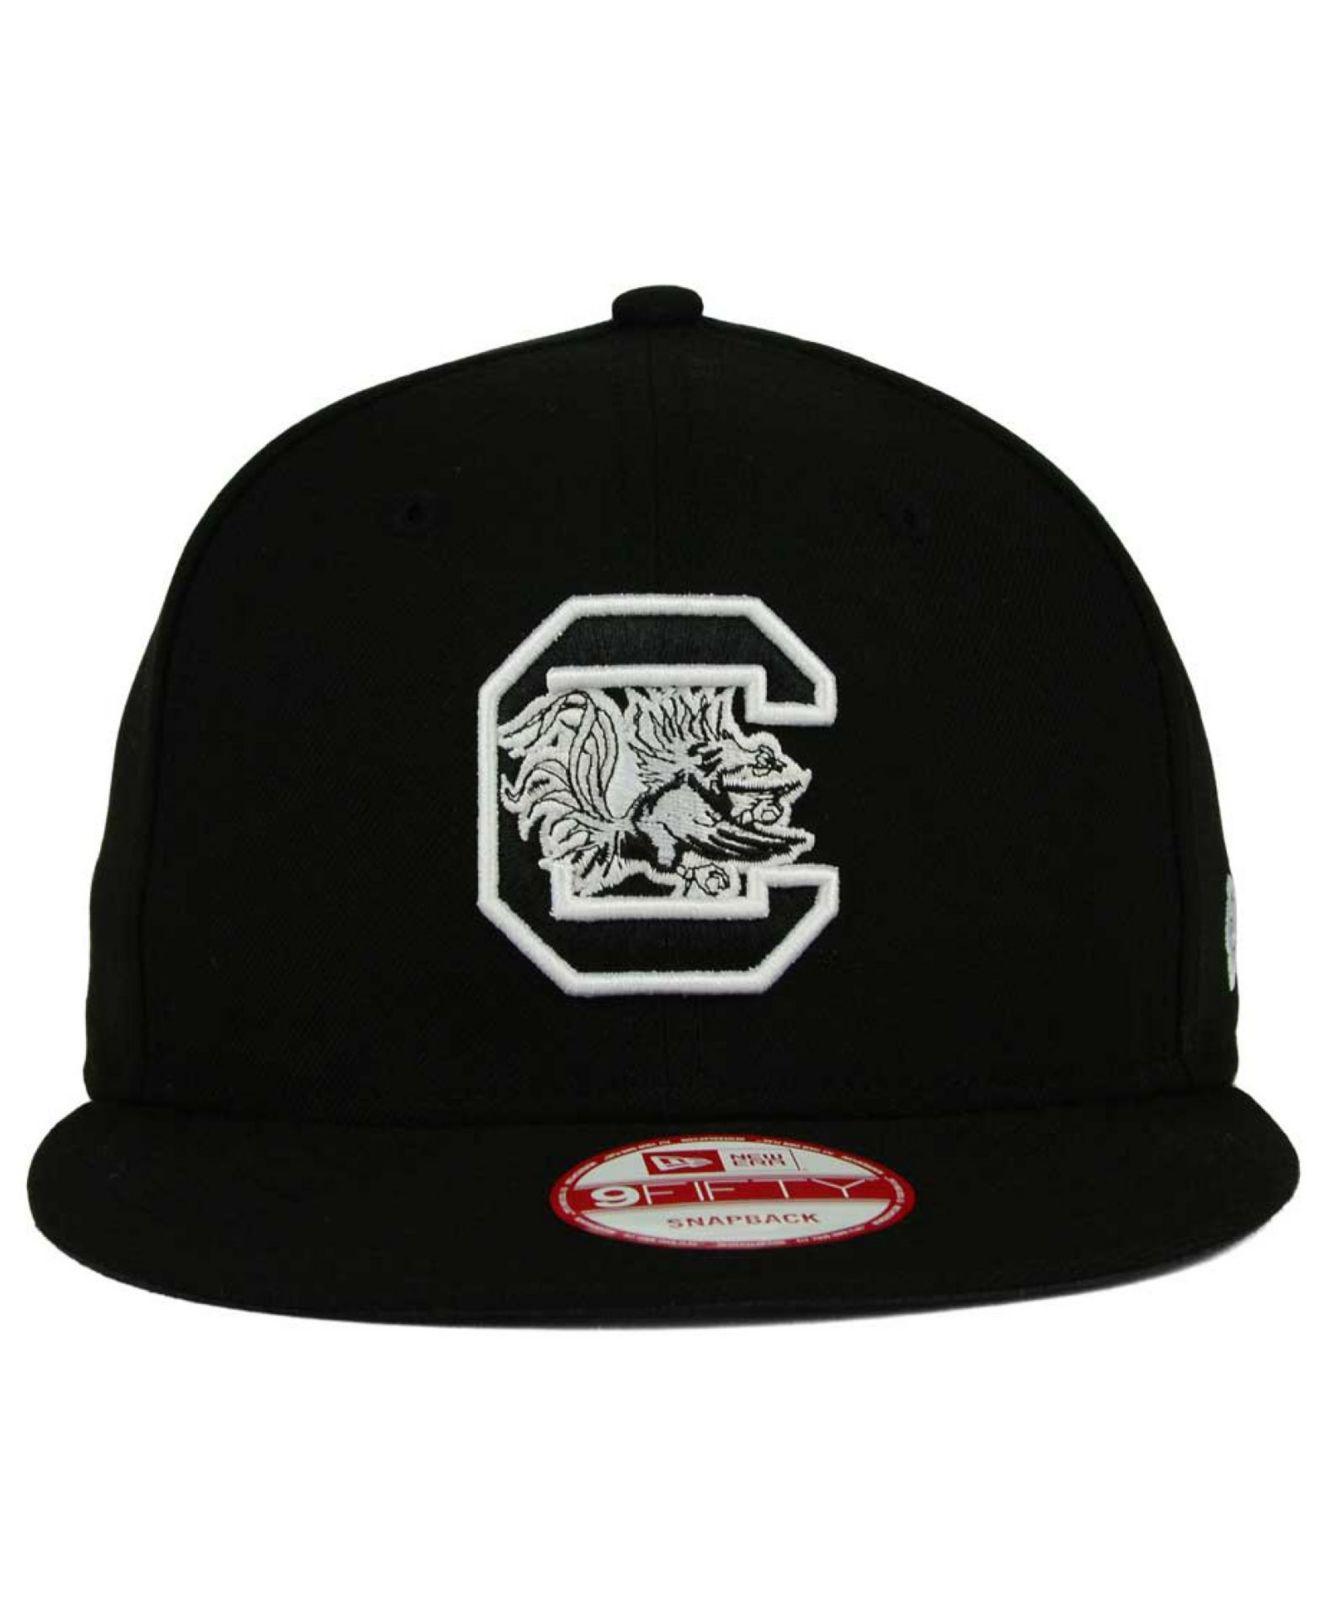 quality design bafdd 71e05 Lyst - KTZ South Carolina Gamecocks Ncaa Black White Fashion 9fifty  Snapback Cap in Black for Men